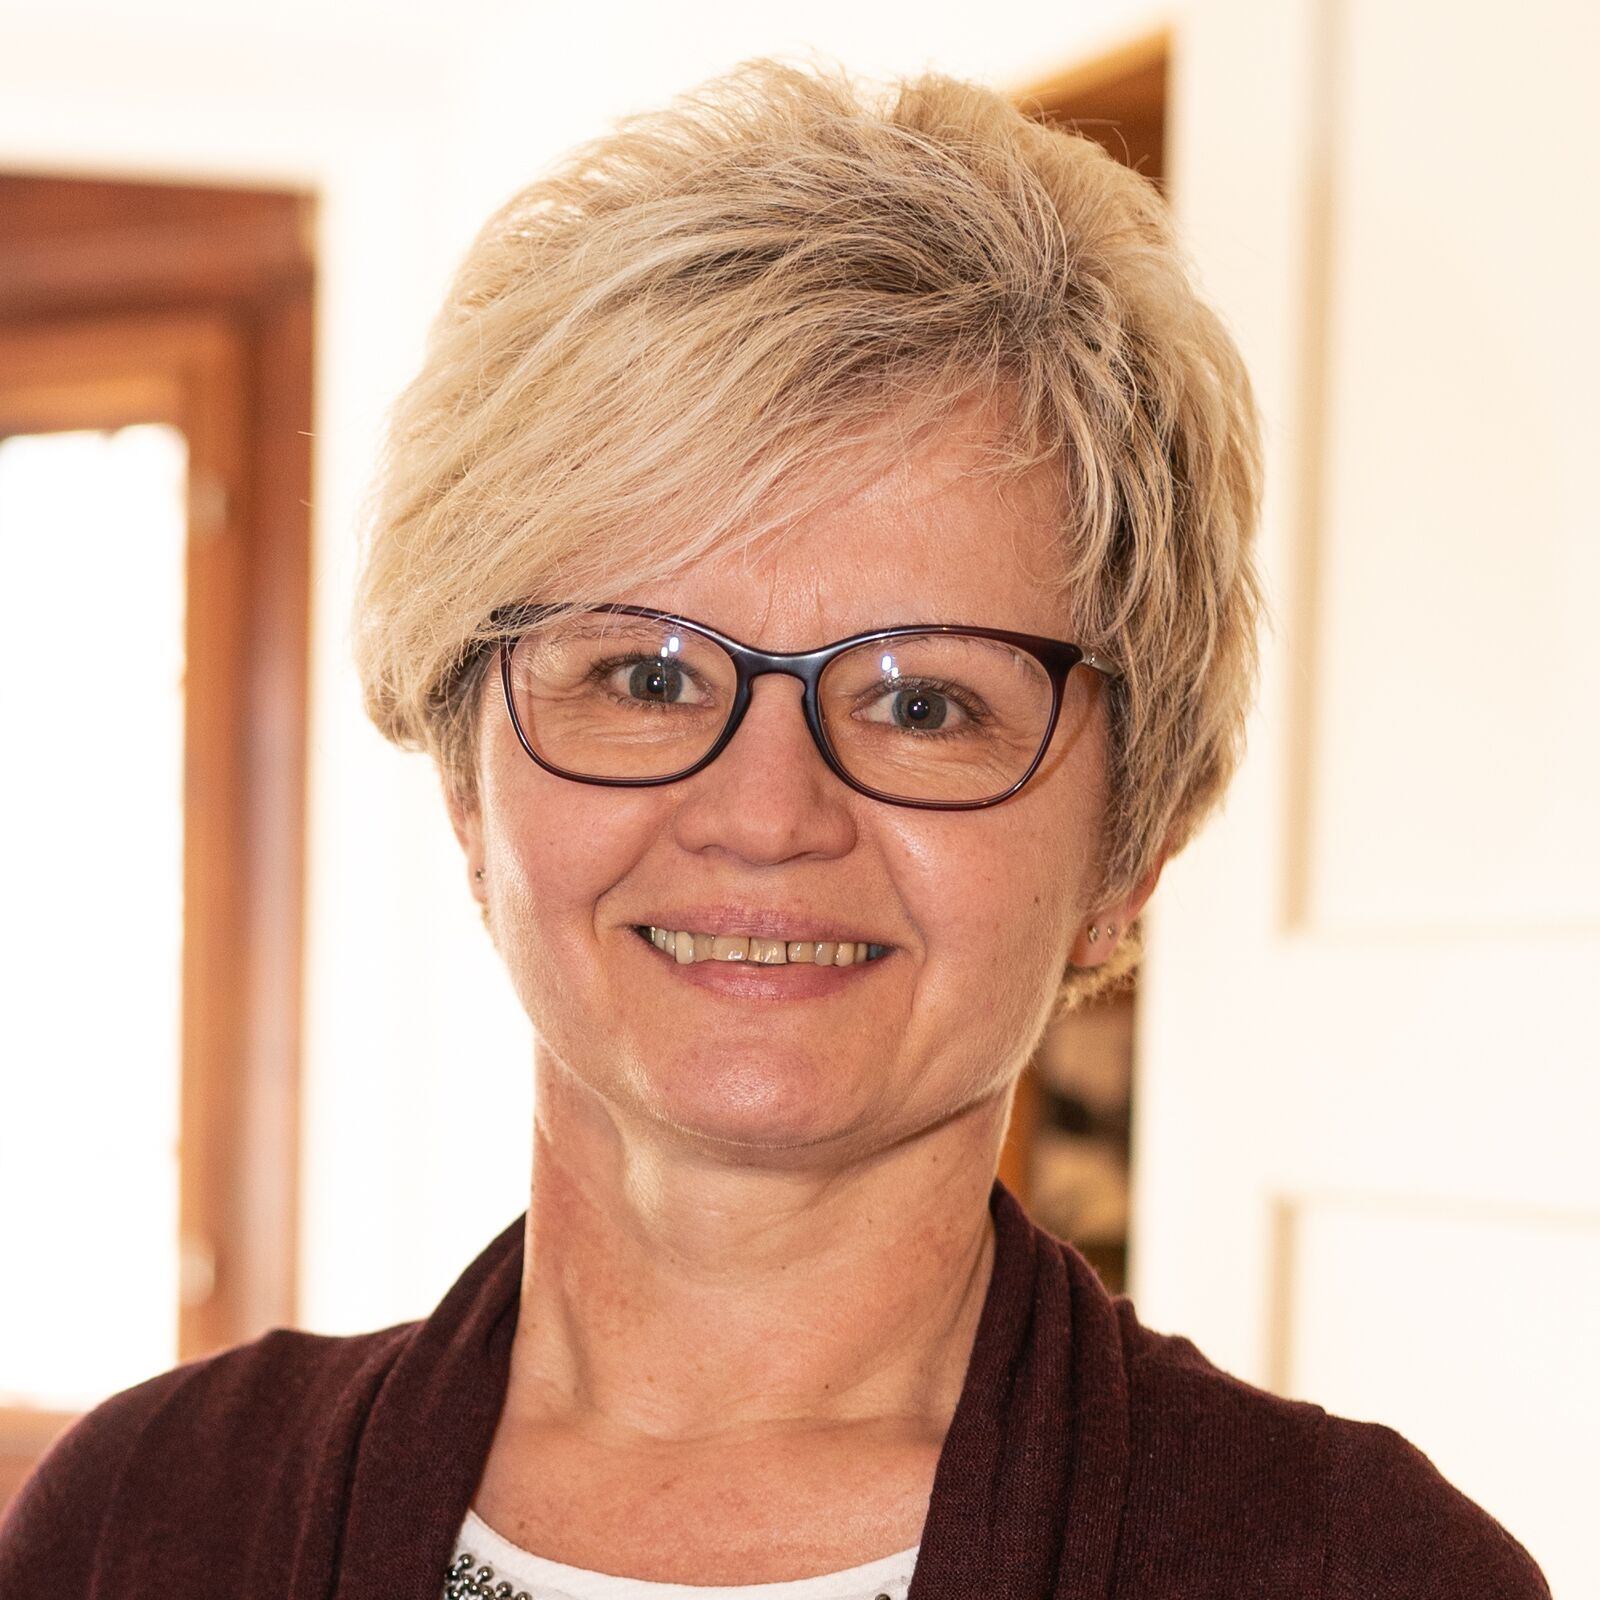 Christa Hehenberger